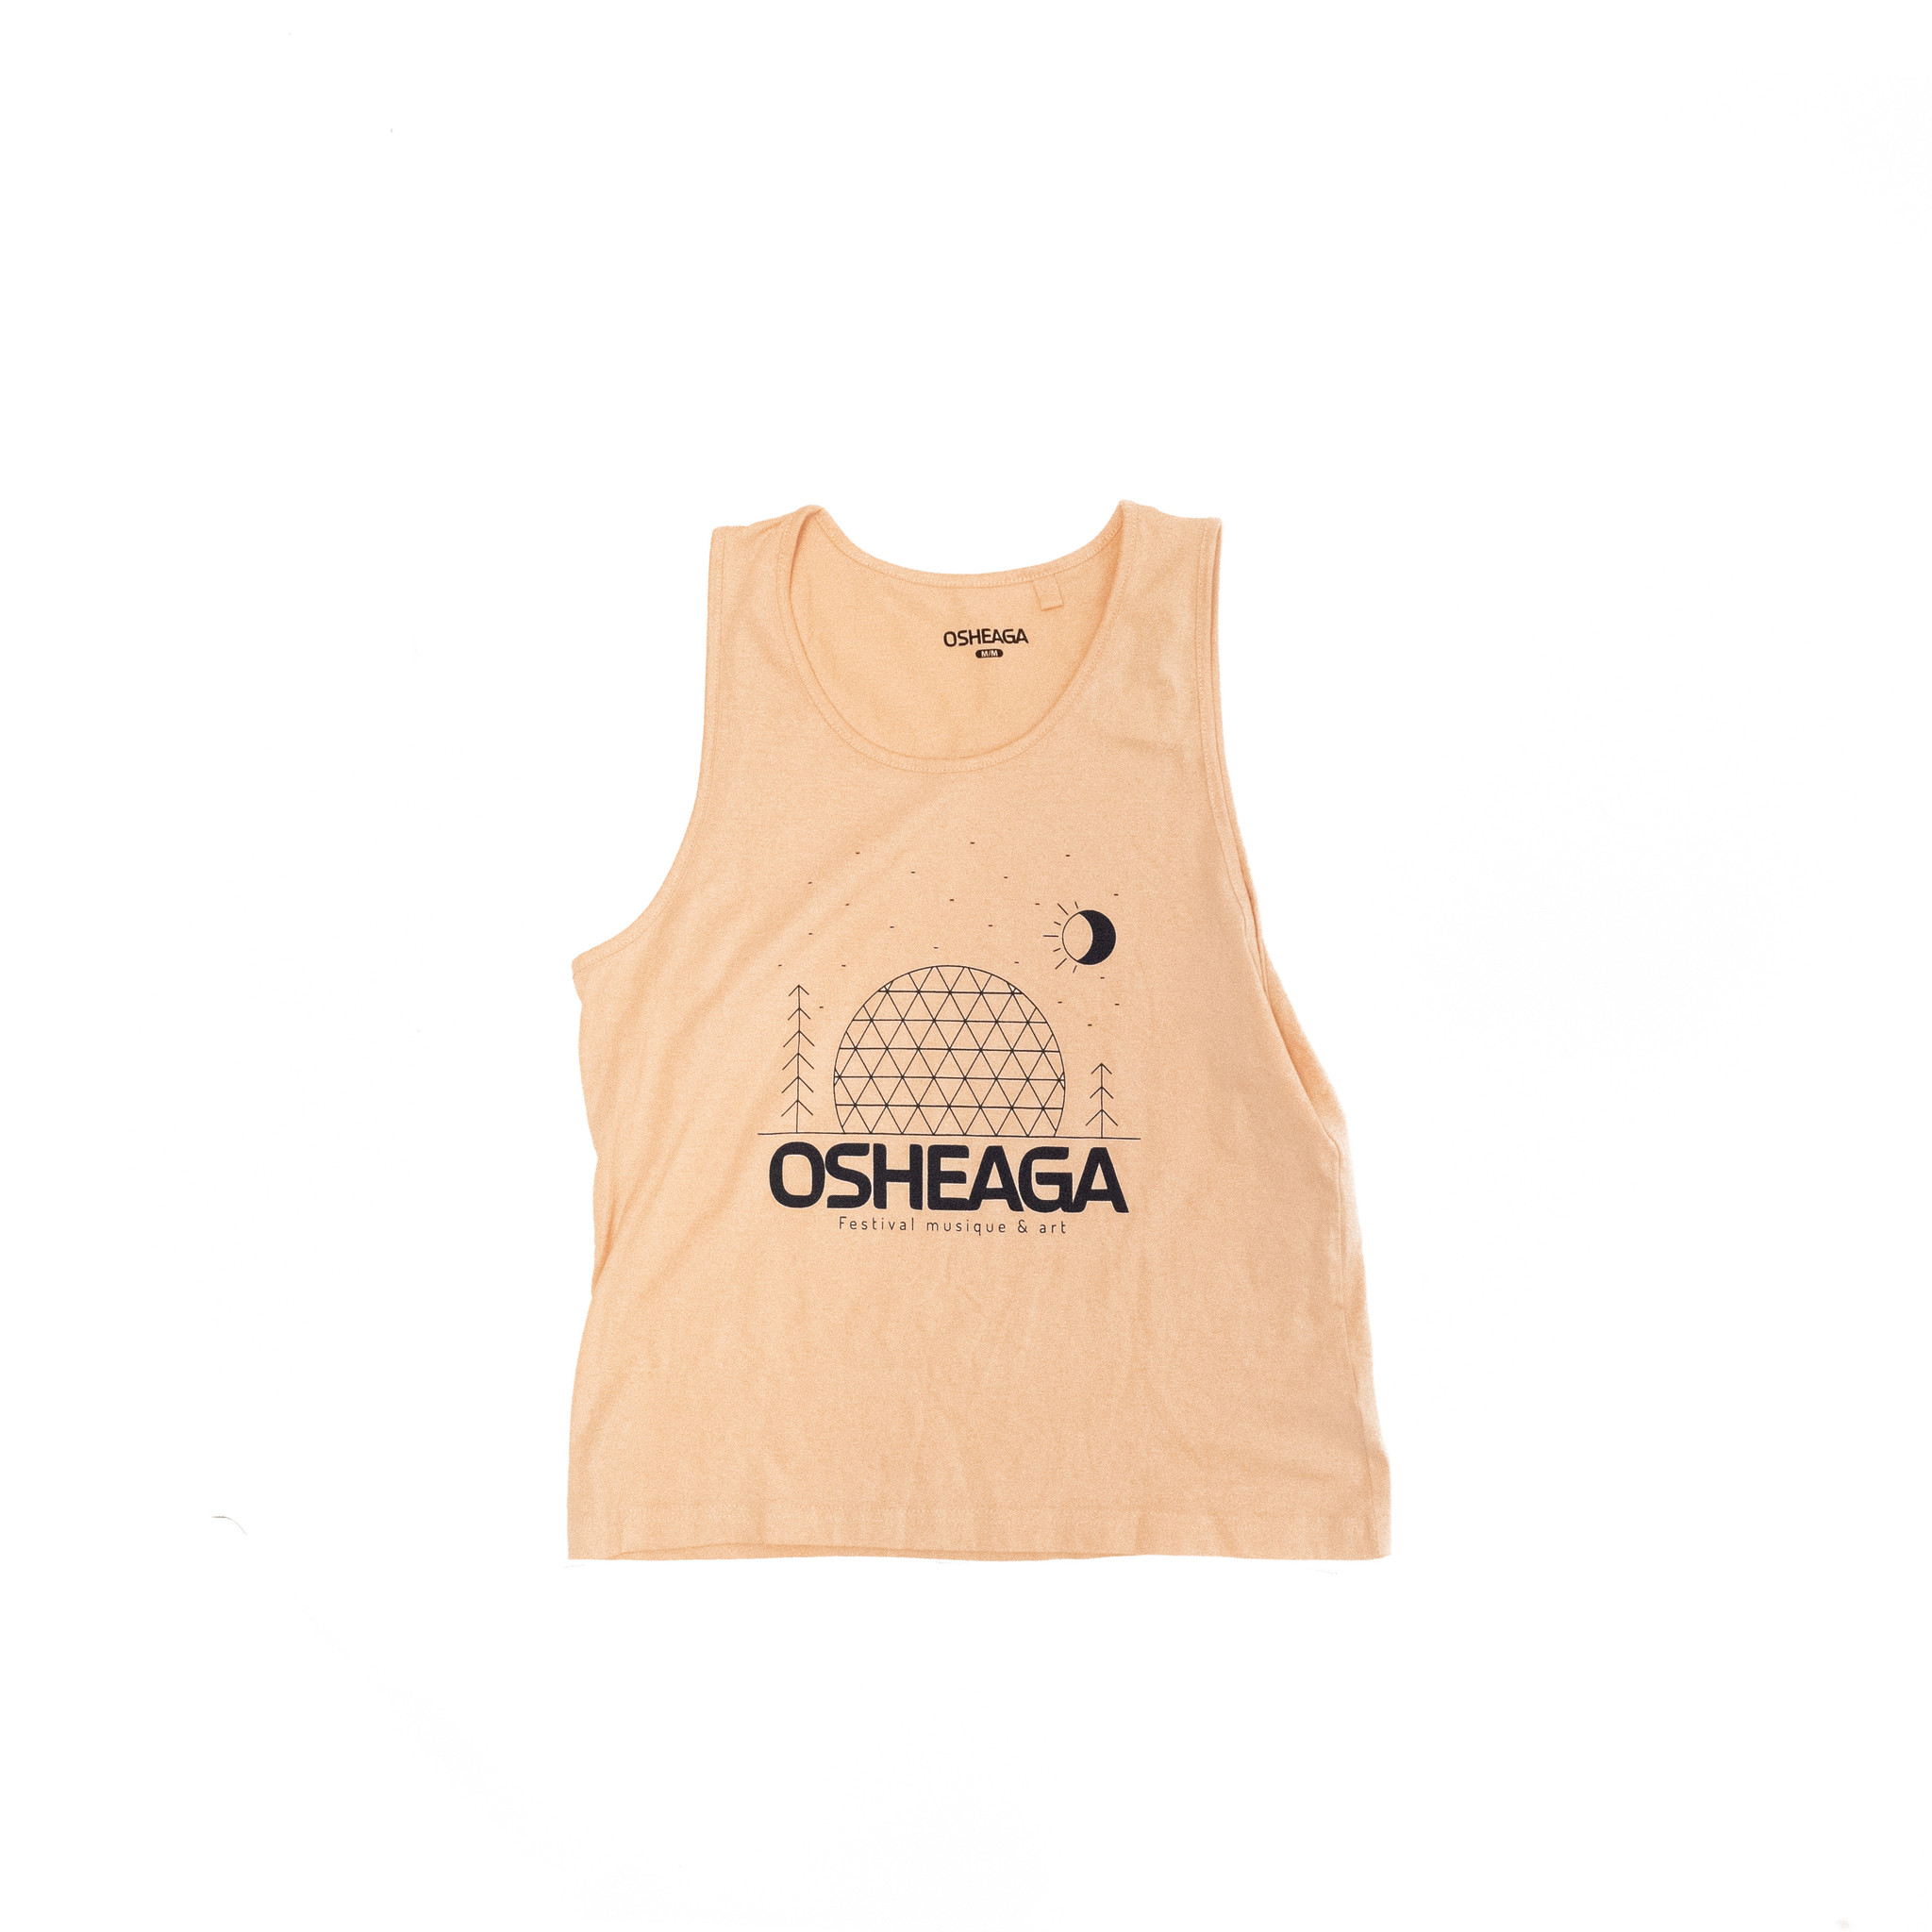 Osheaga Unisex Dome Tank